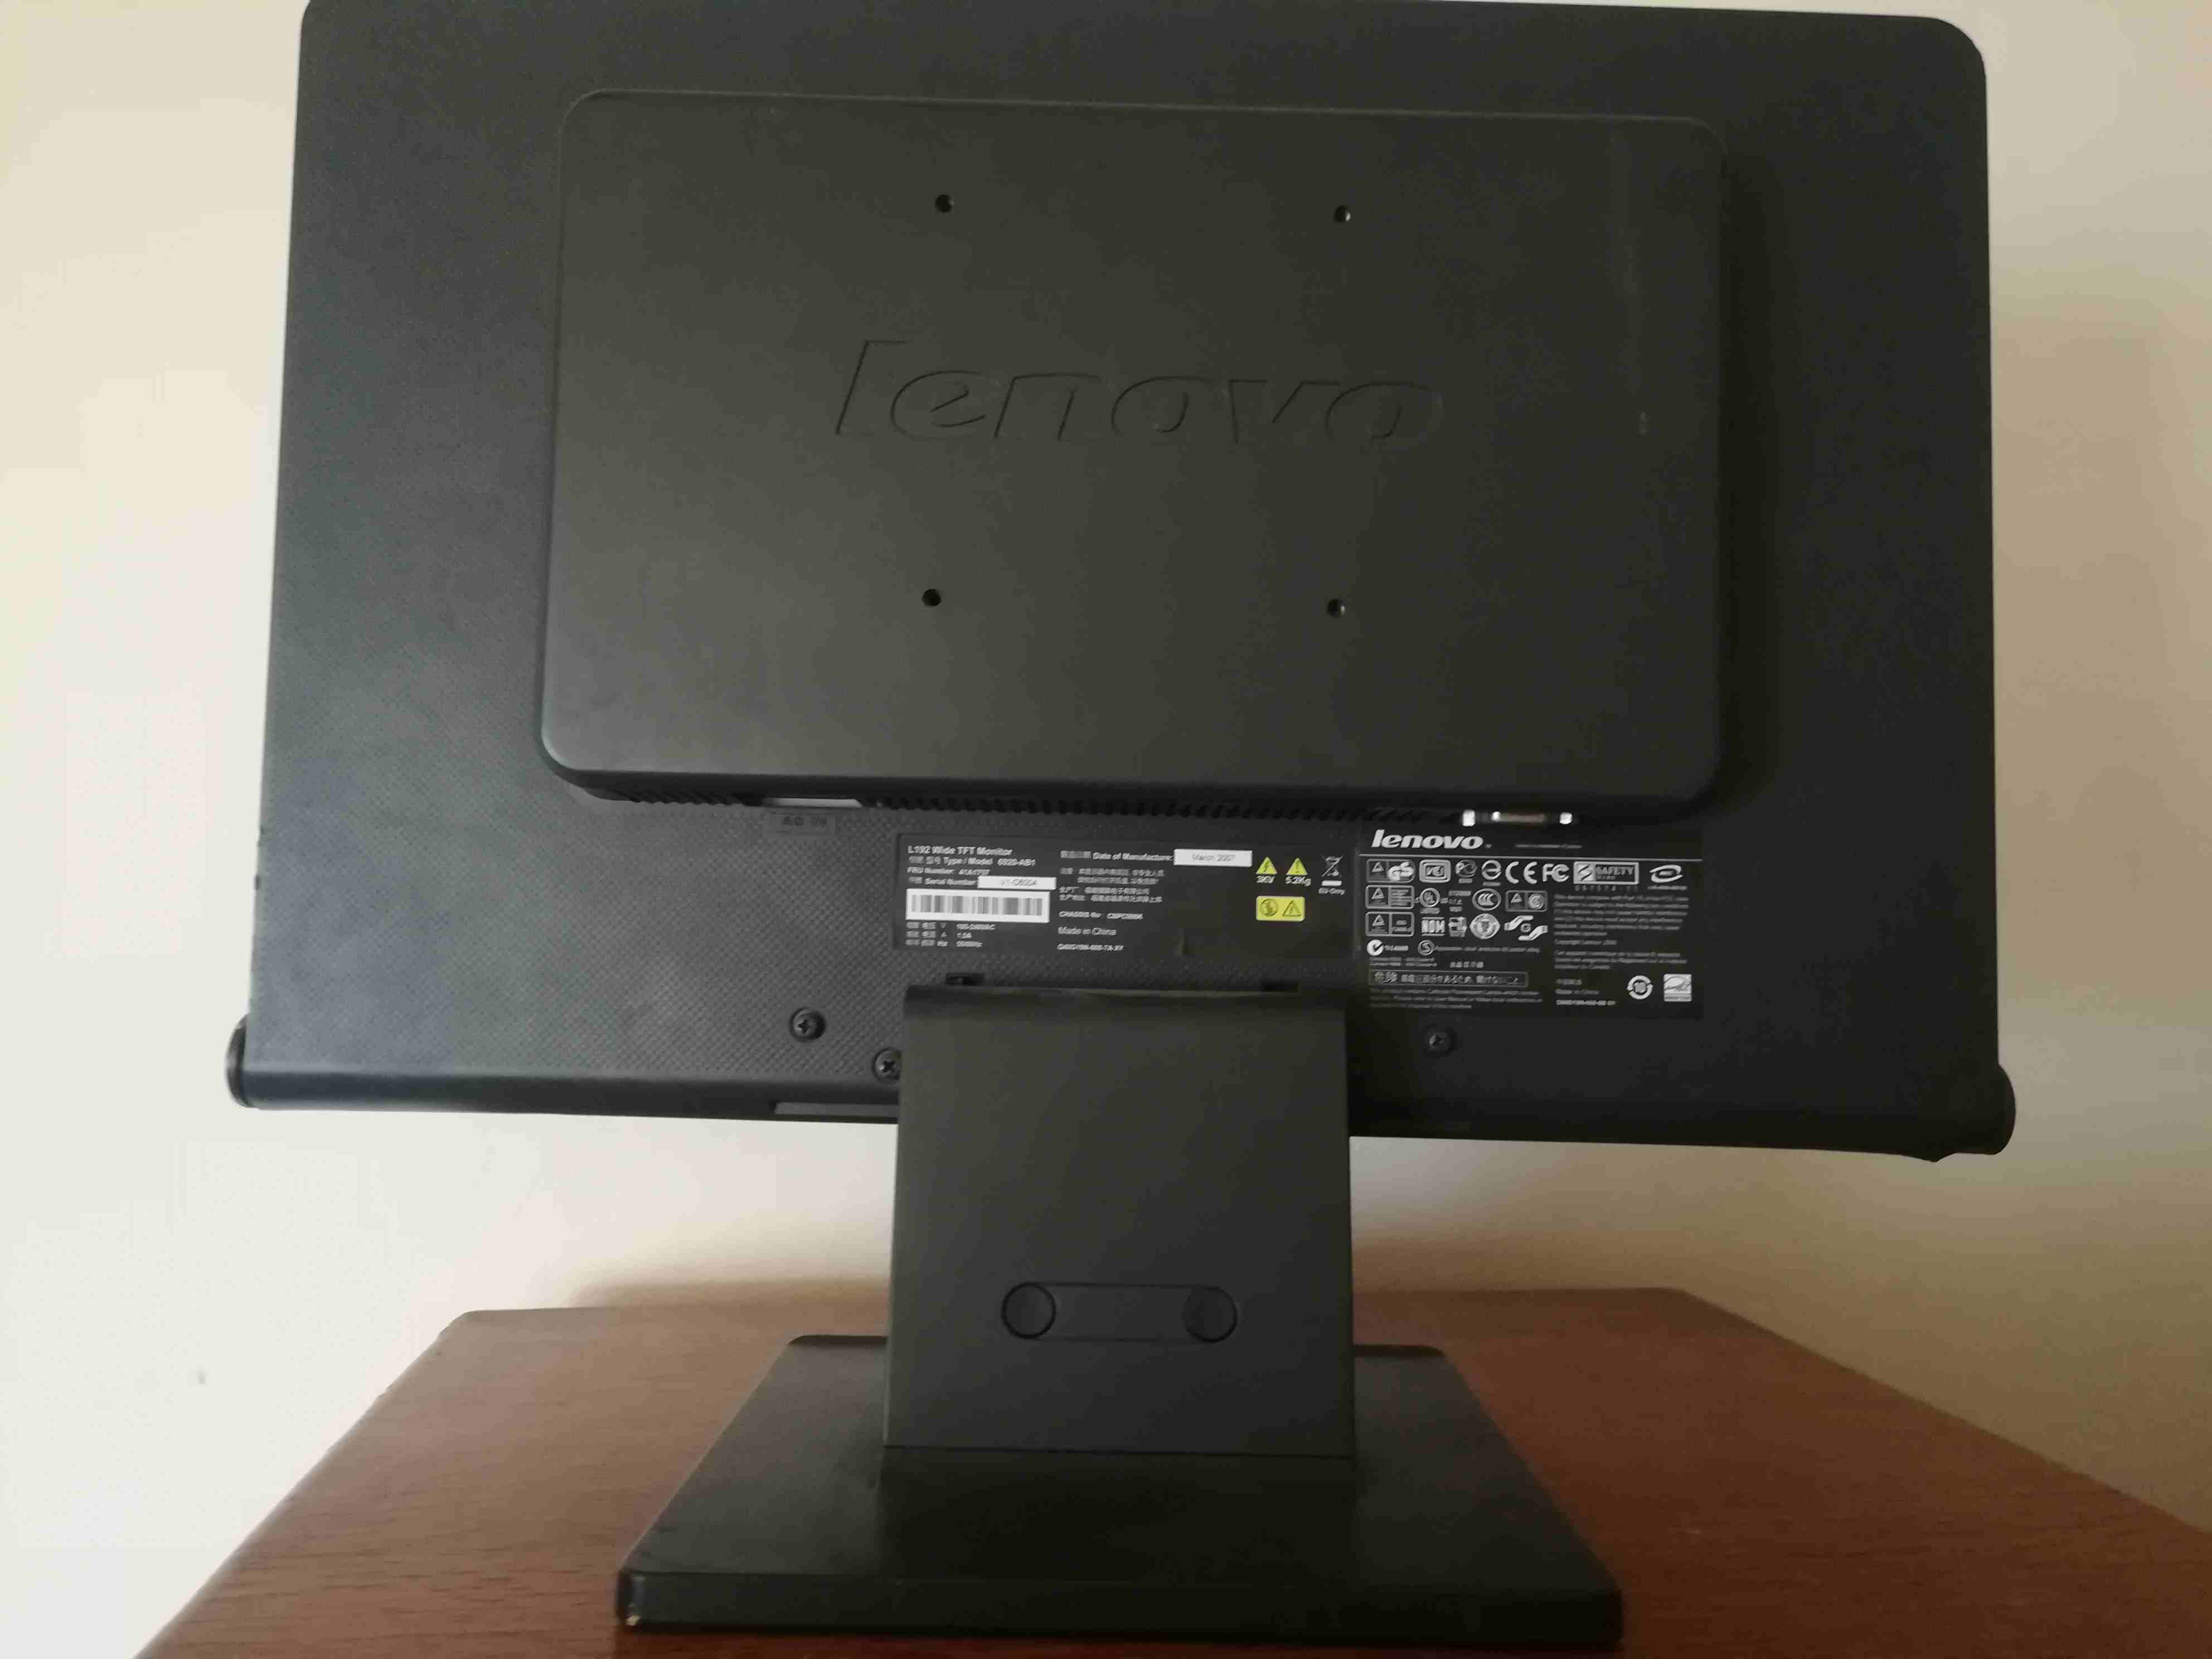 Hyundai touch laptop-  شاشة كمبيوتر لا تنسَ أنك...